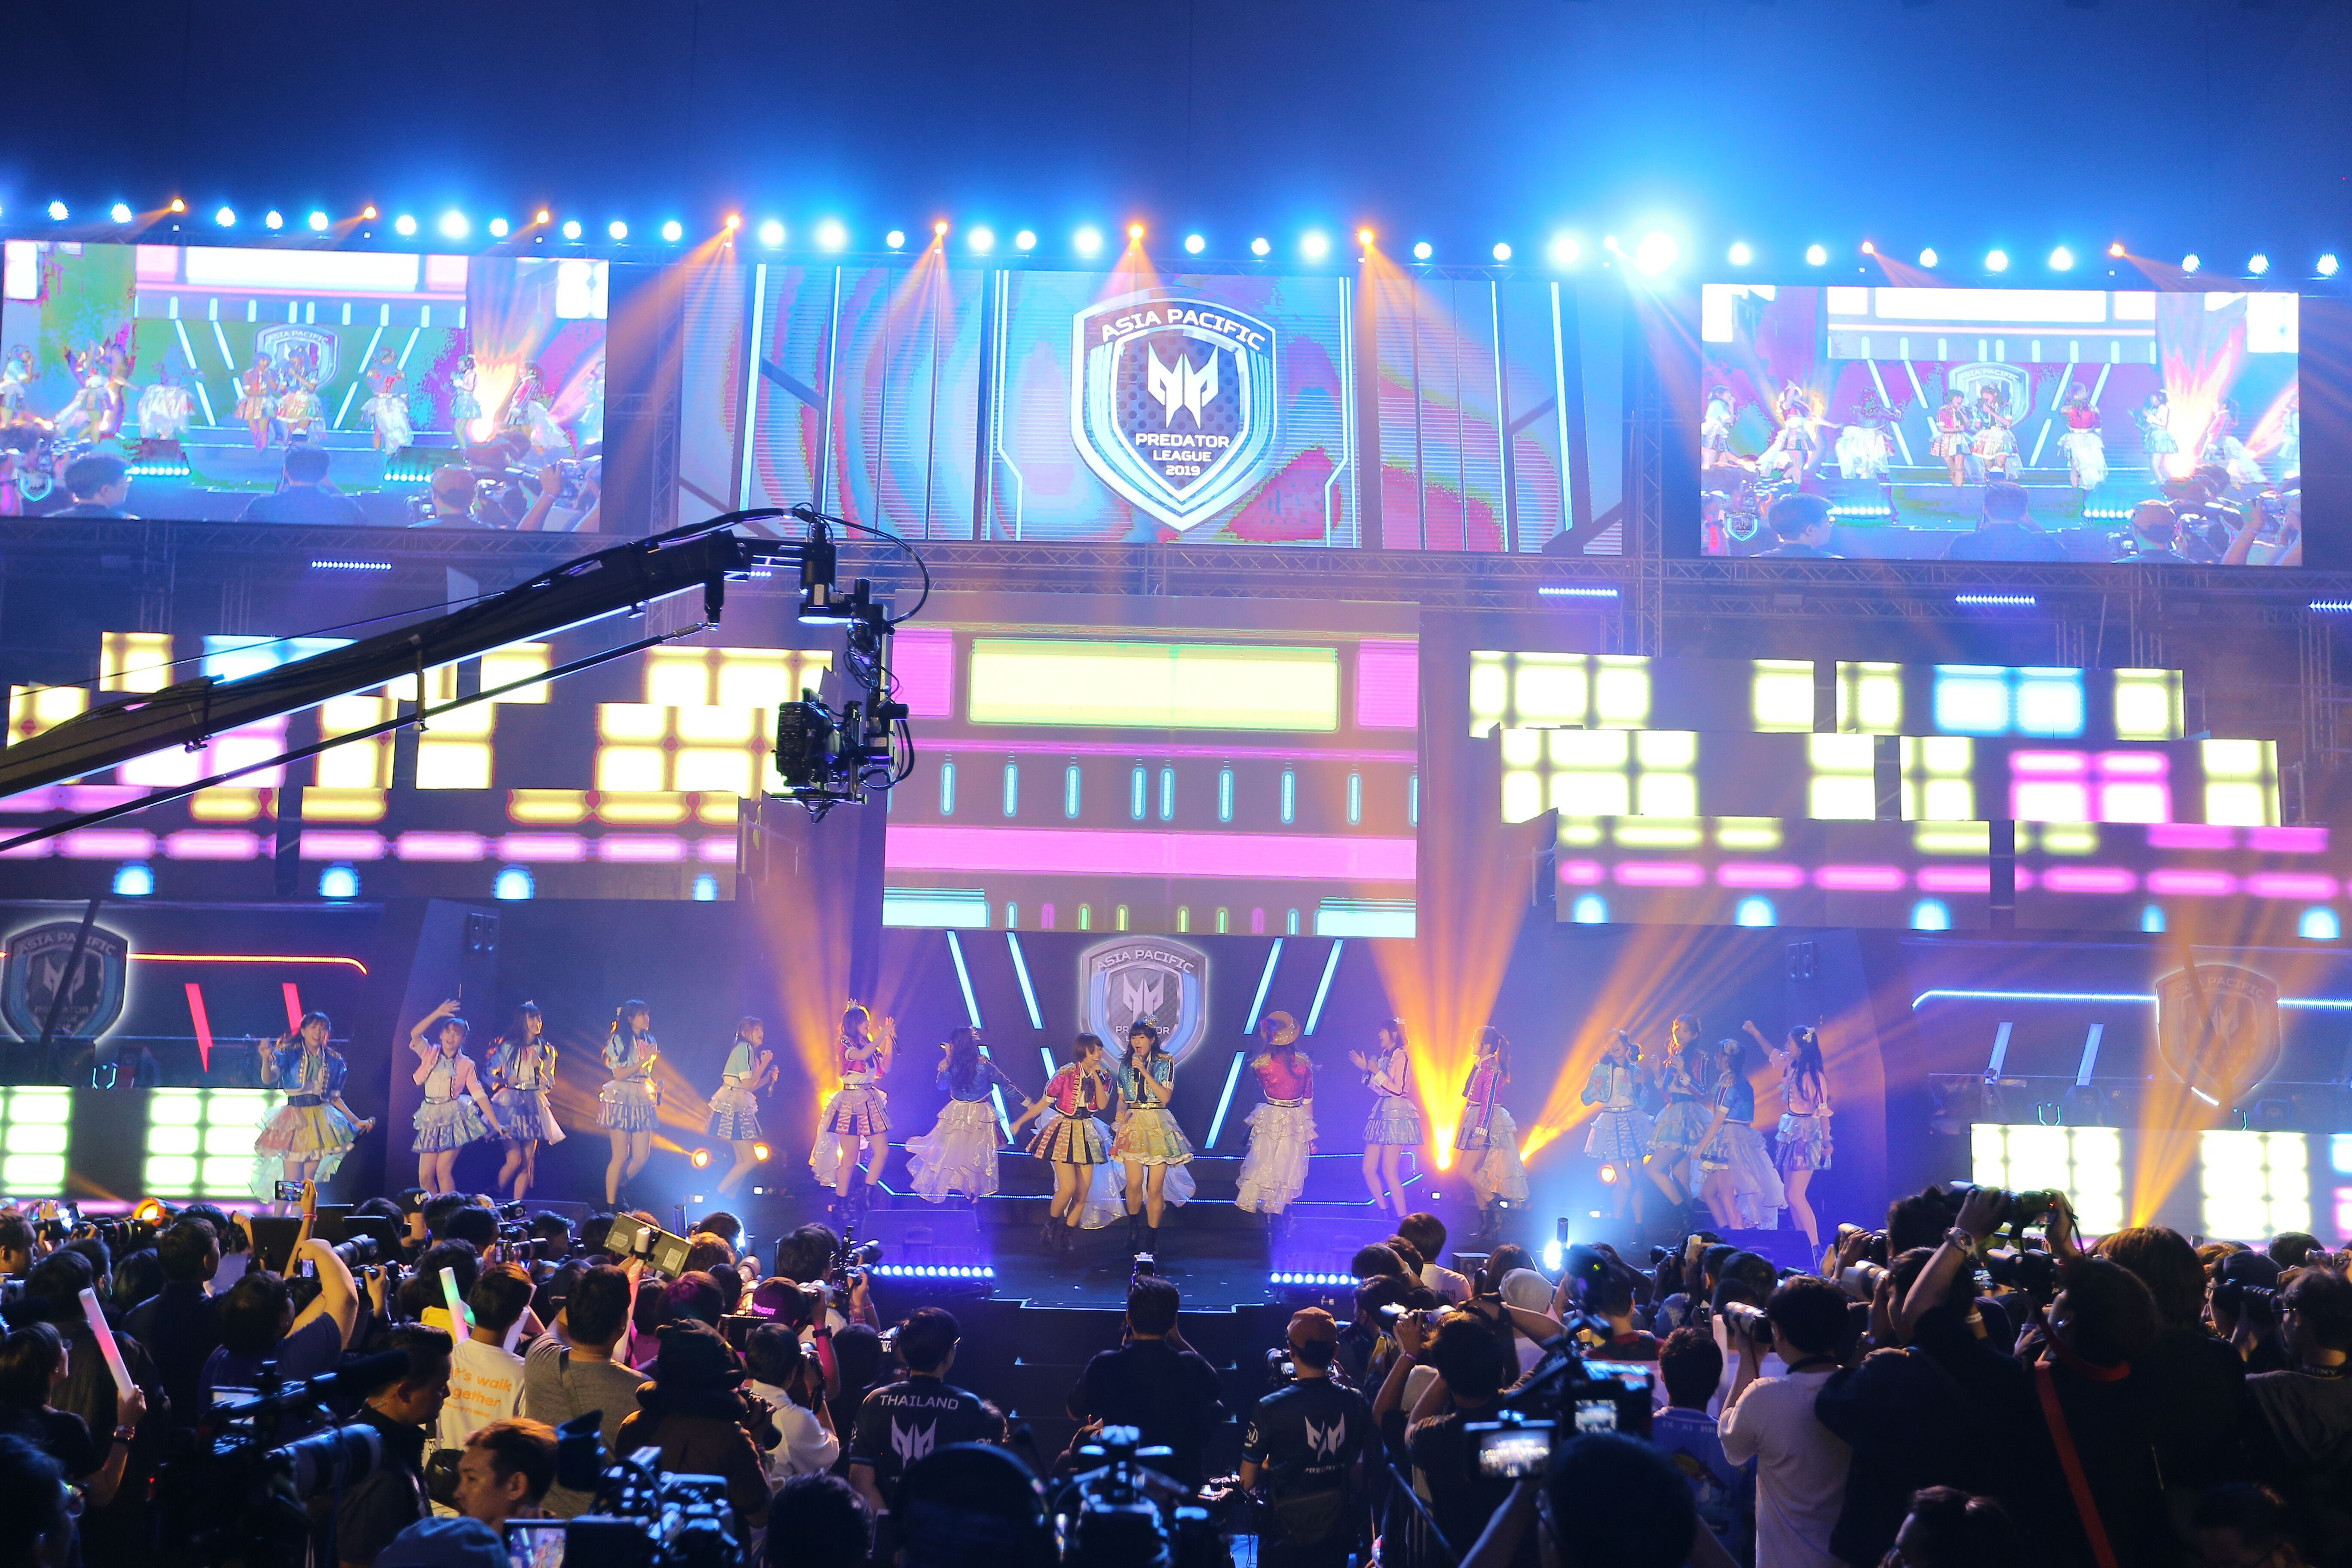 gfvycaey jpeg บรรยากาศงาน Asia Pacific Predator League 2019 สุดยอดขุนพลทีมอีสปอร์ตเข้าร่วมการแข่งขันรอบแกรนด์ไฟนอล